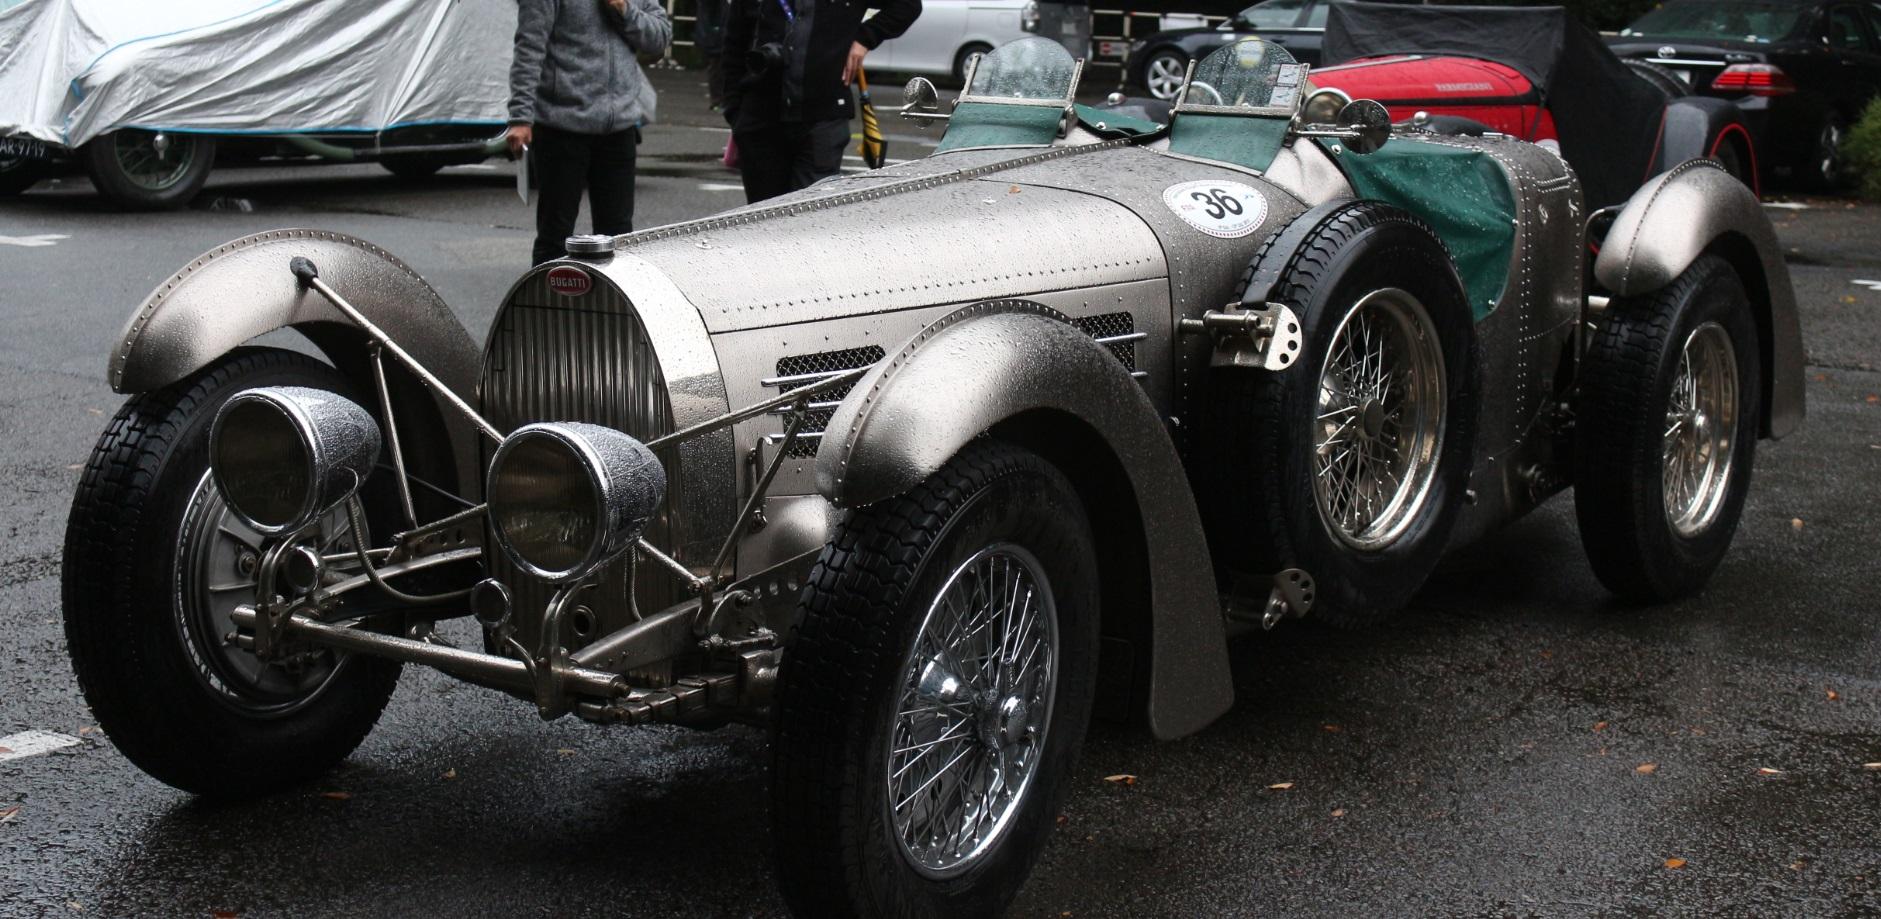 Bugatti, Bugatti T57, International Bugatti Meeting Japan, La Festa Mille Miglia, LFMM, T57, ブガッティ, ラフェスタミレミリア, competition electron,